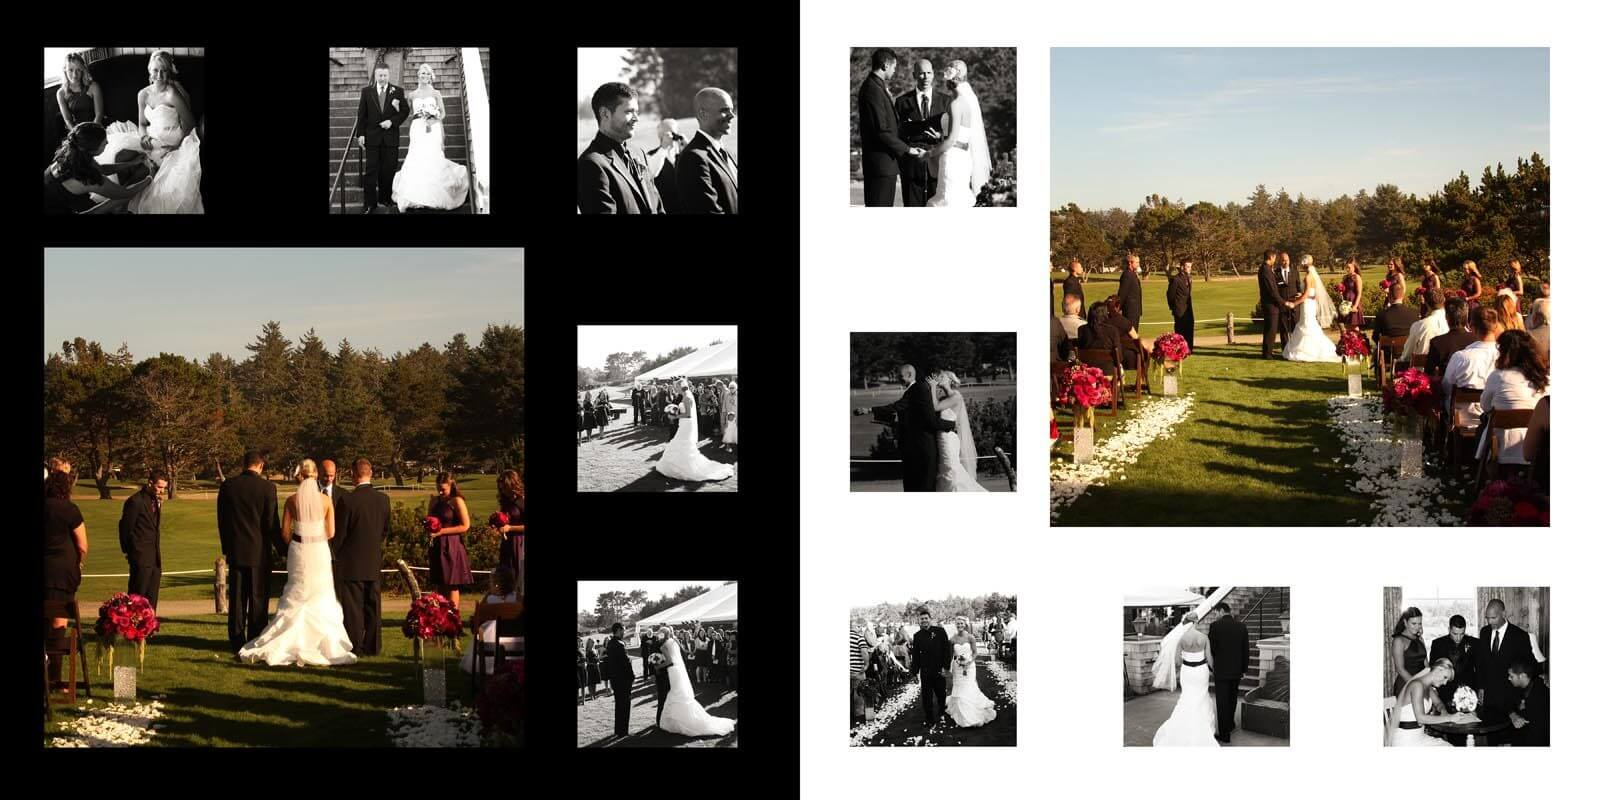 gearheart-cannon-beach-mcmenamins-oregon-coast-wedding-026-027.jpg